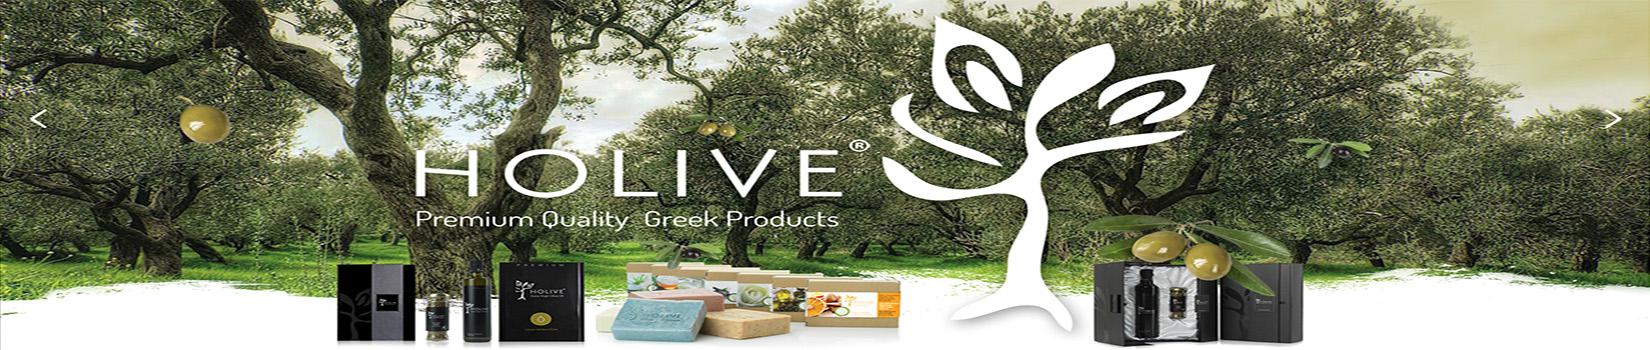 HOLIVE Ltd